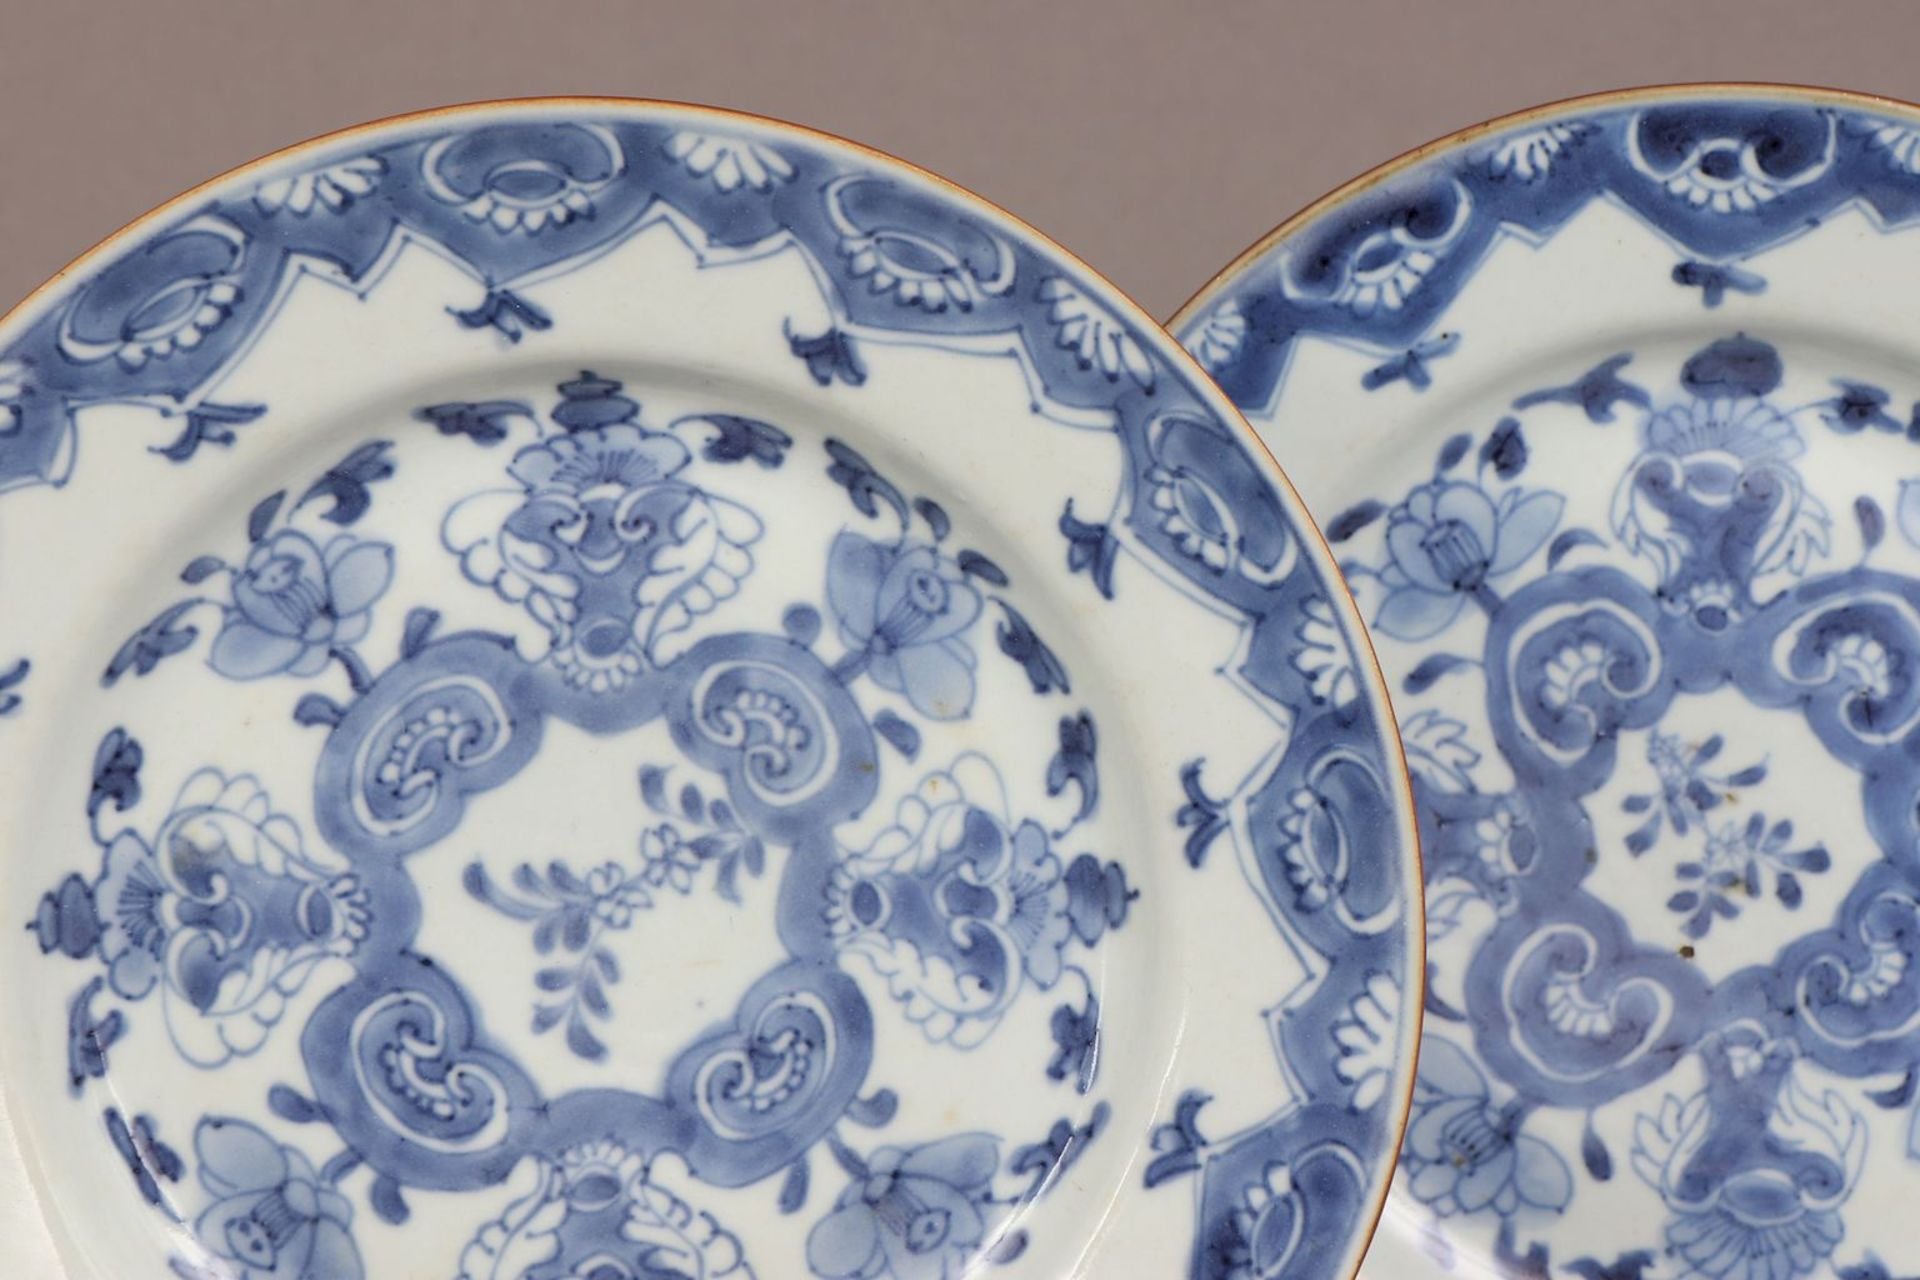 Paar chinesische Porzellanteller - Image 2 of 3